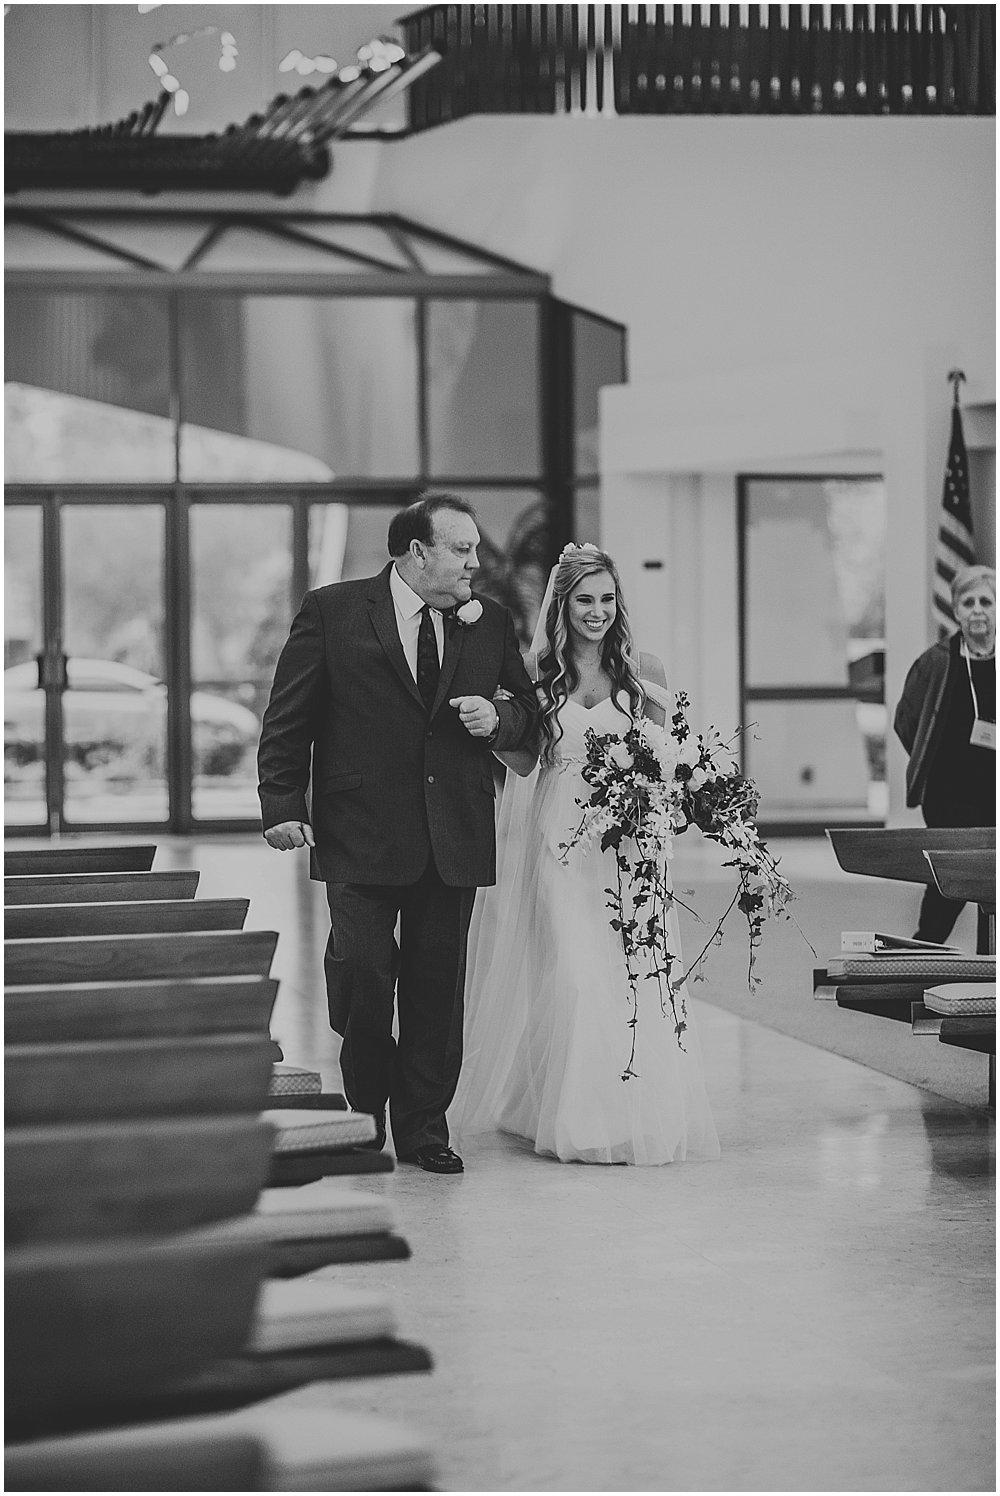 dad-walking-bride-down-the-isle